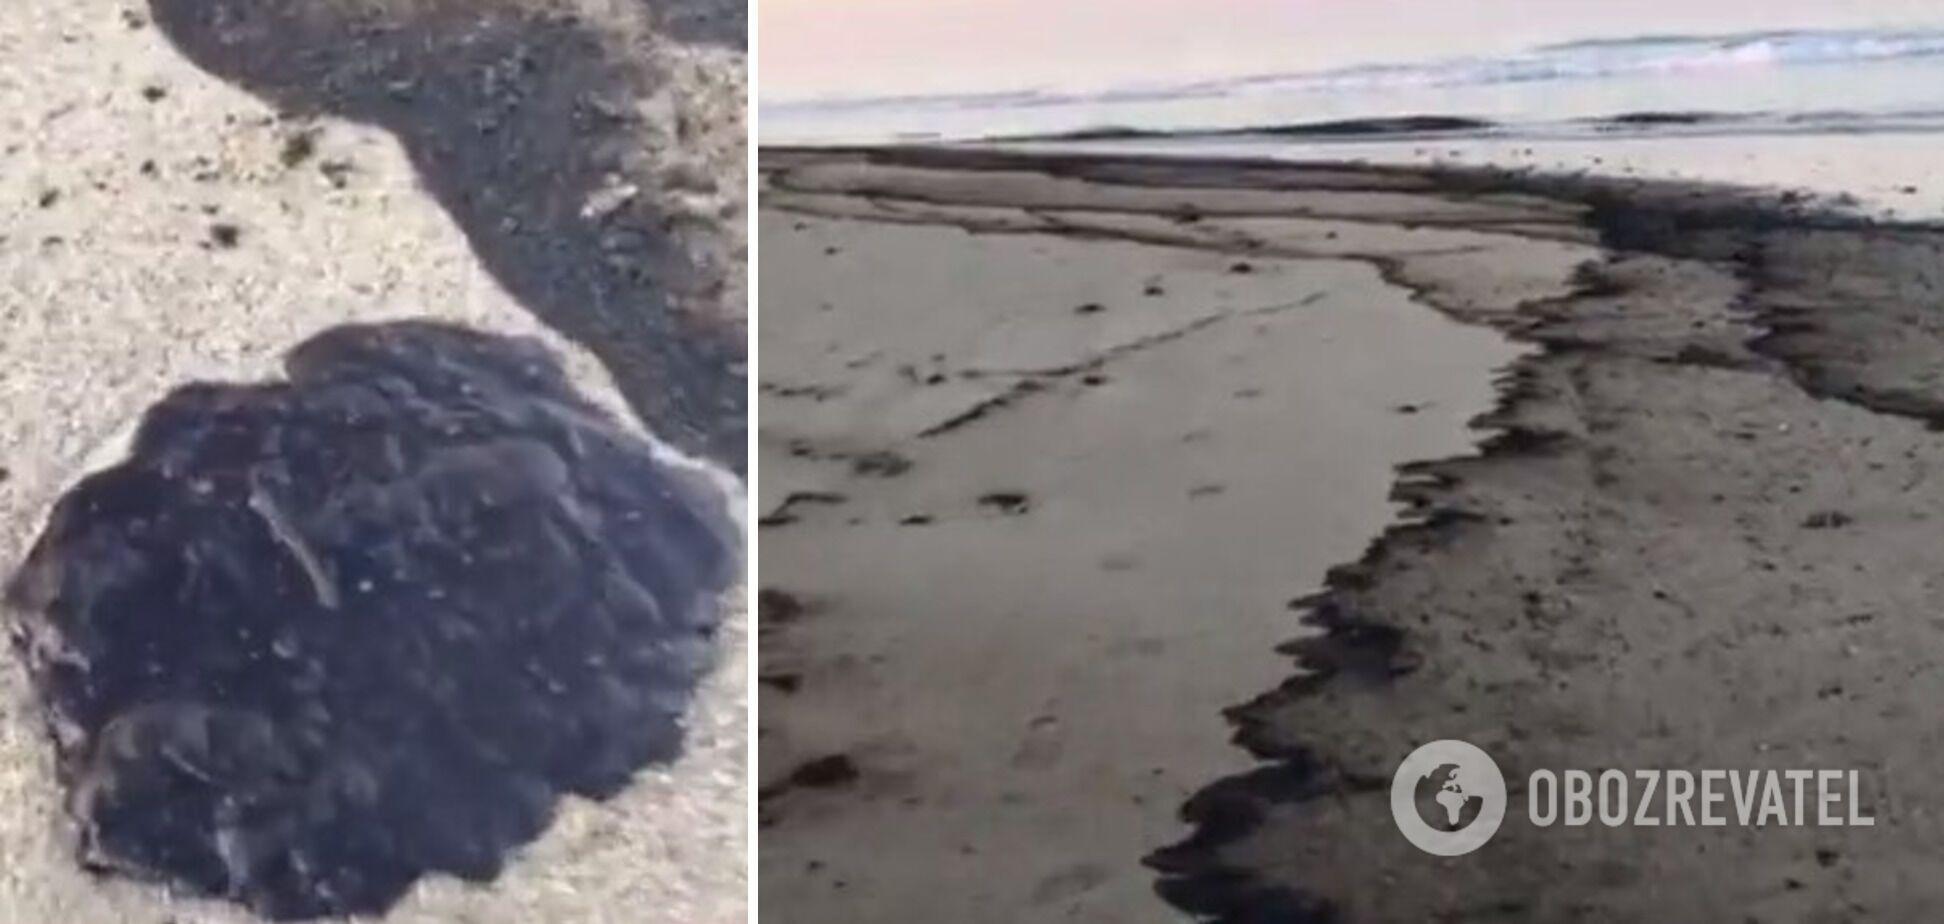 Нафтова пляма покрила близько 20 кв. км океану